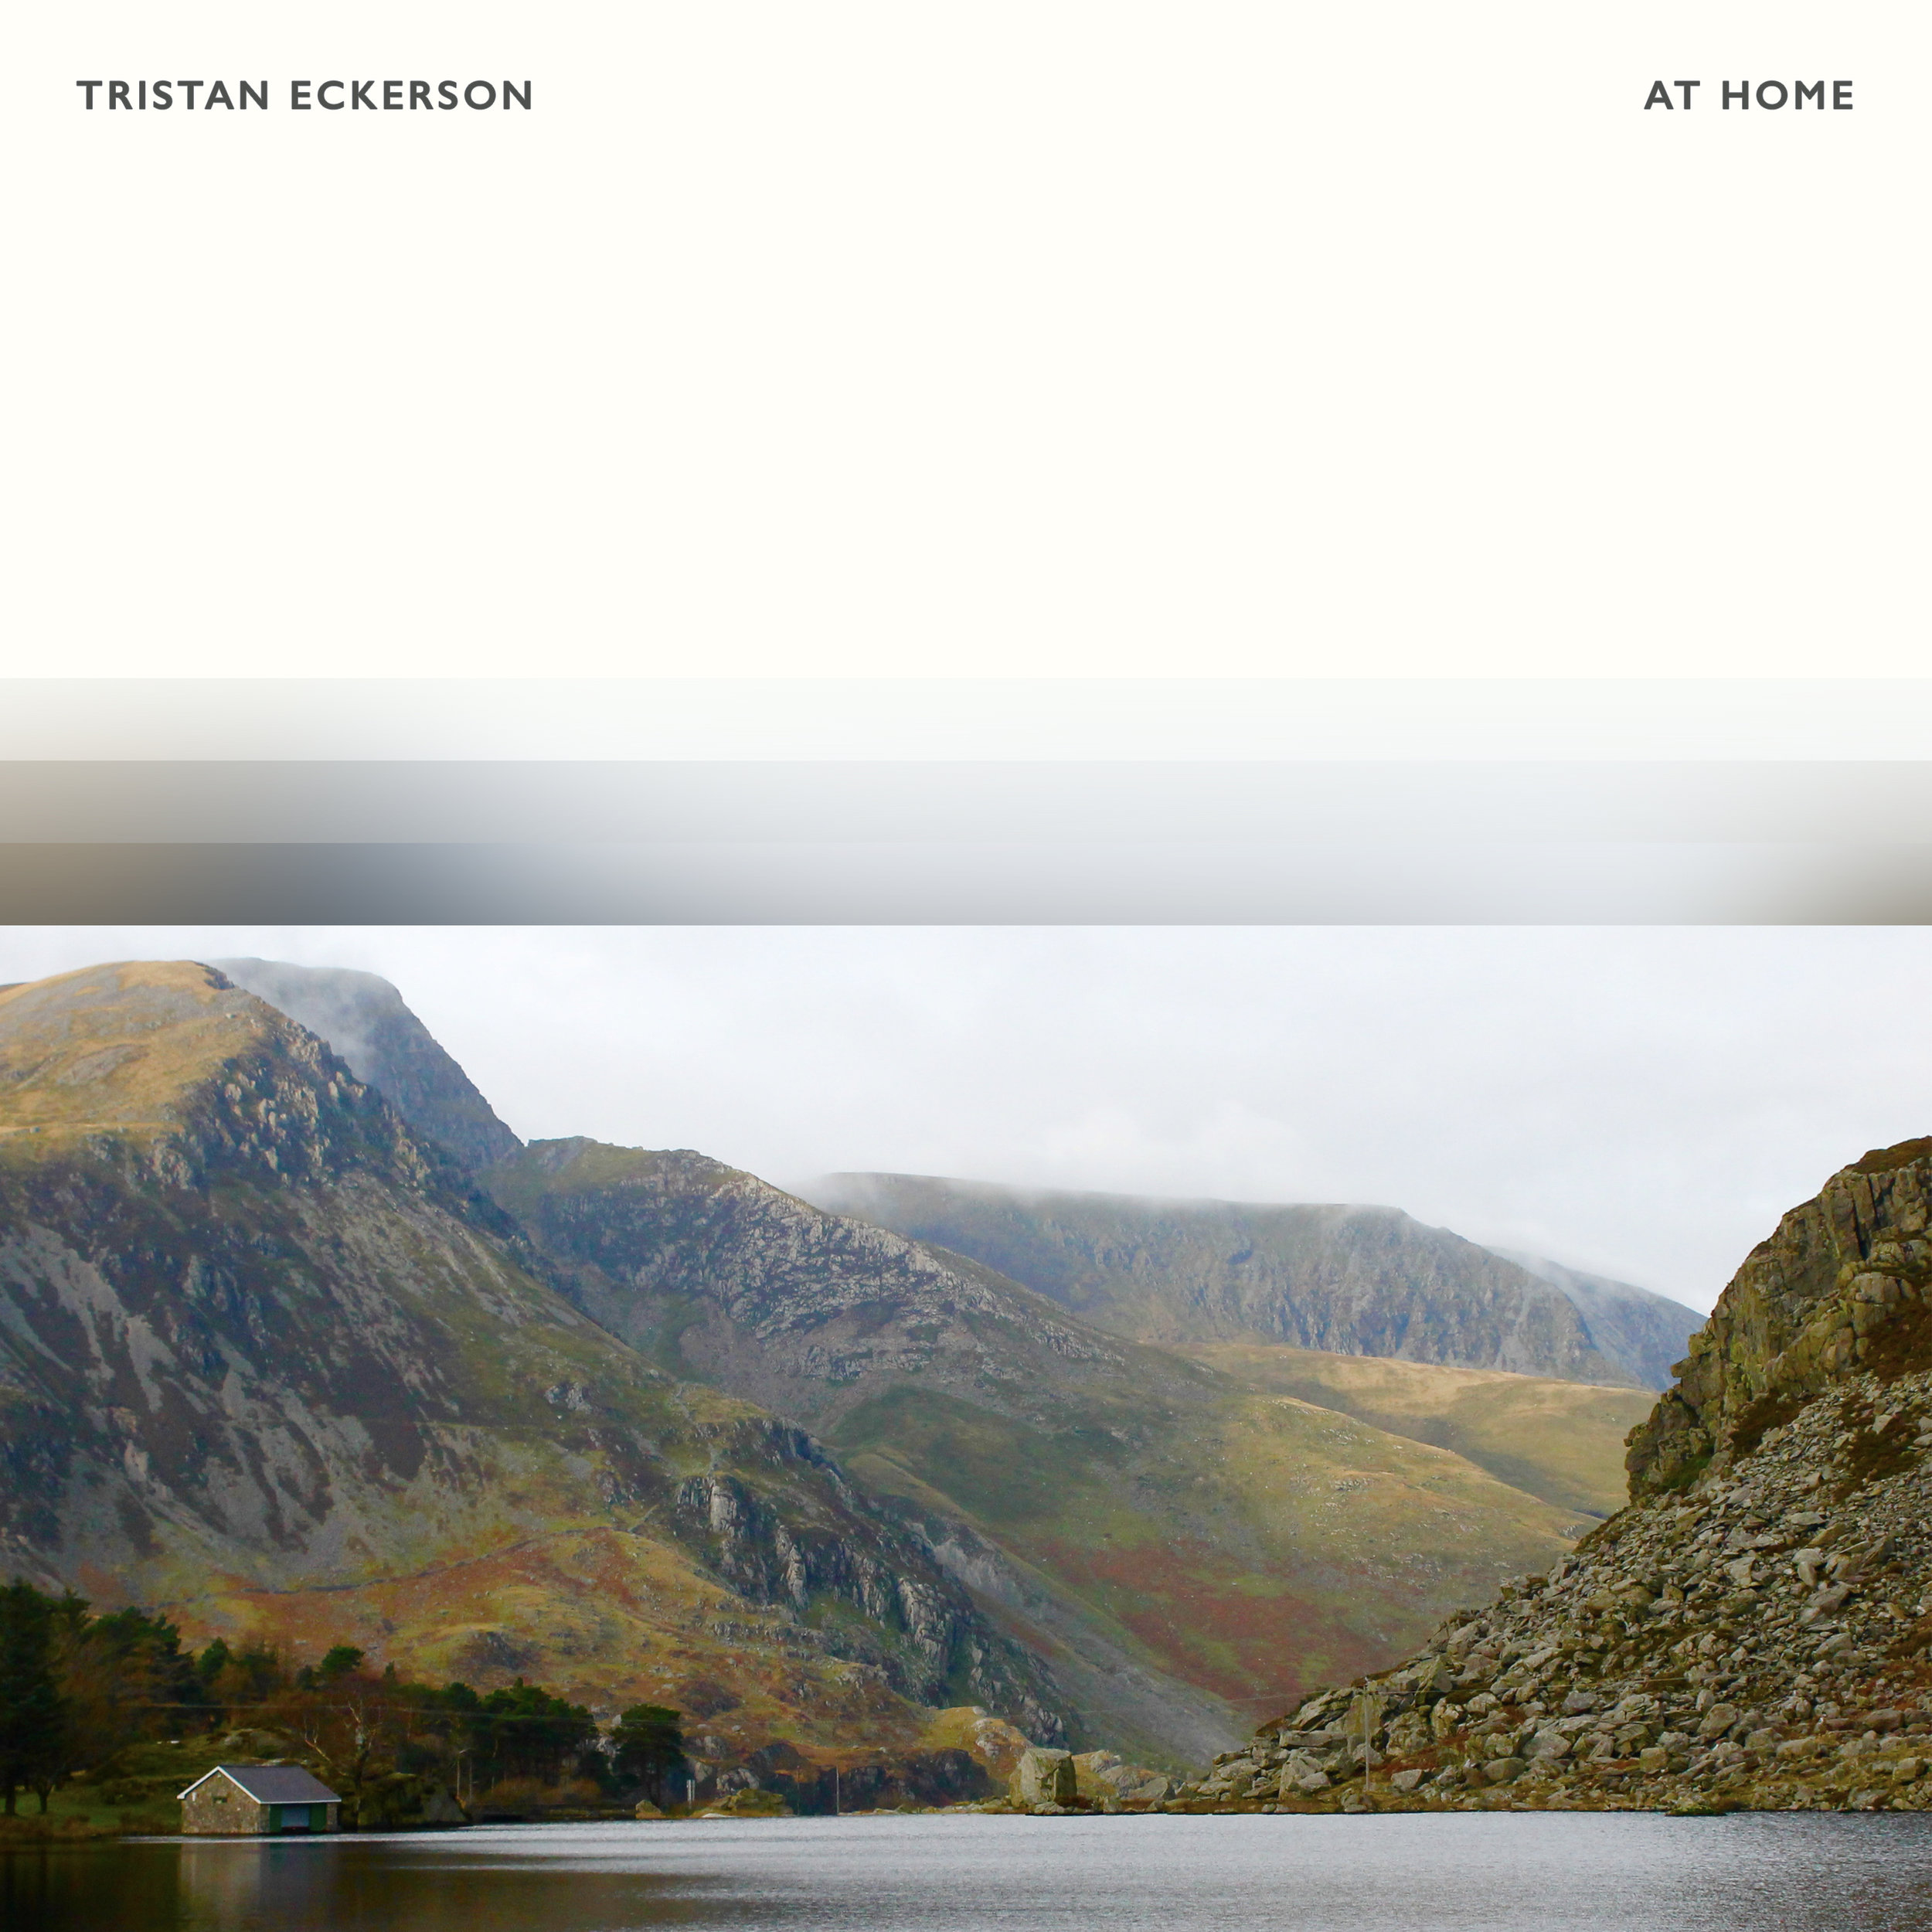 Tristan Eckerson - At Home